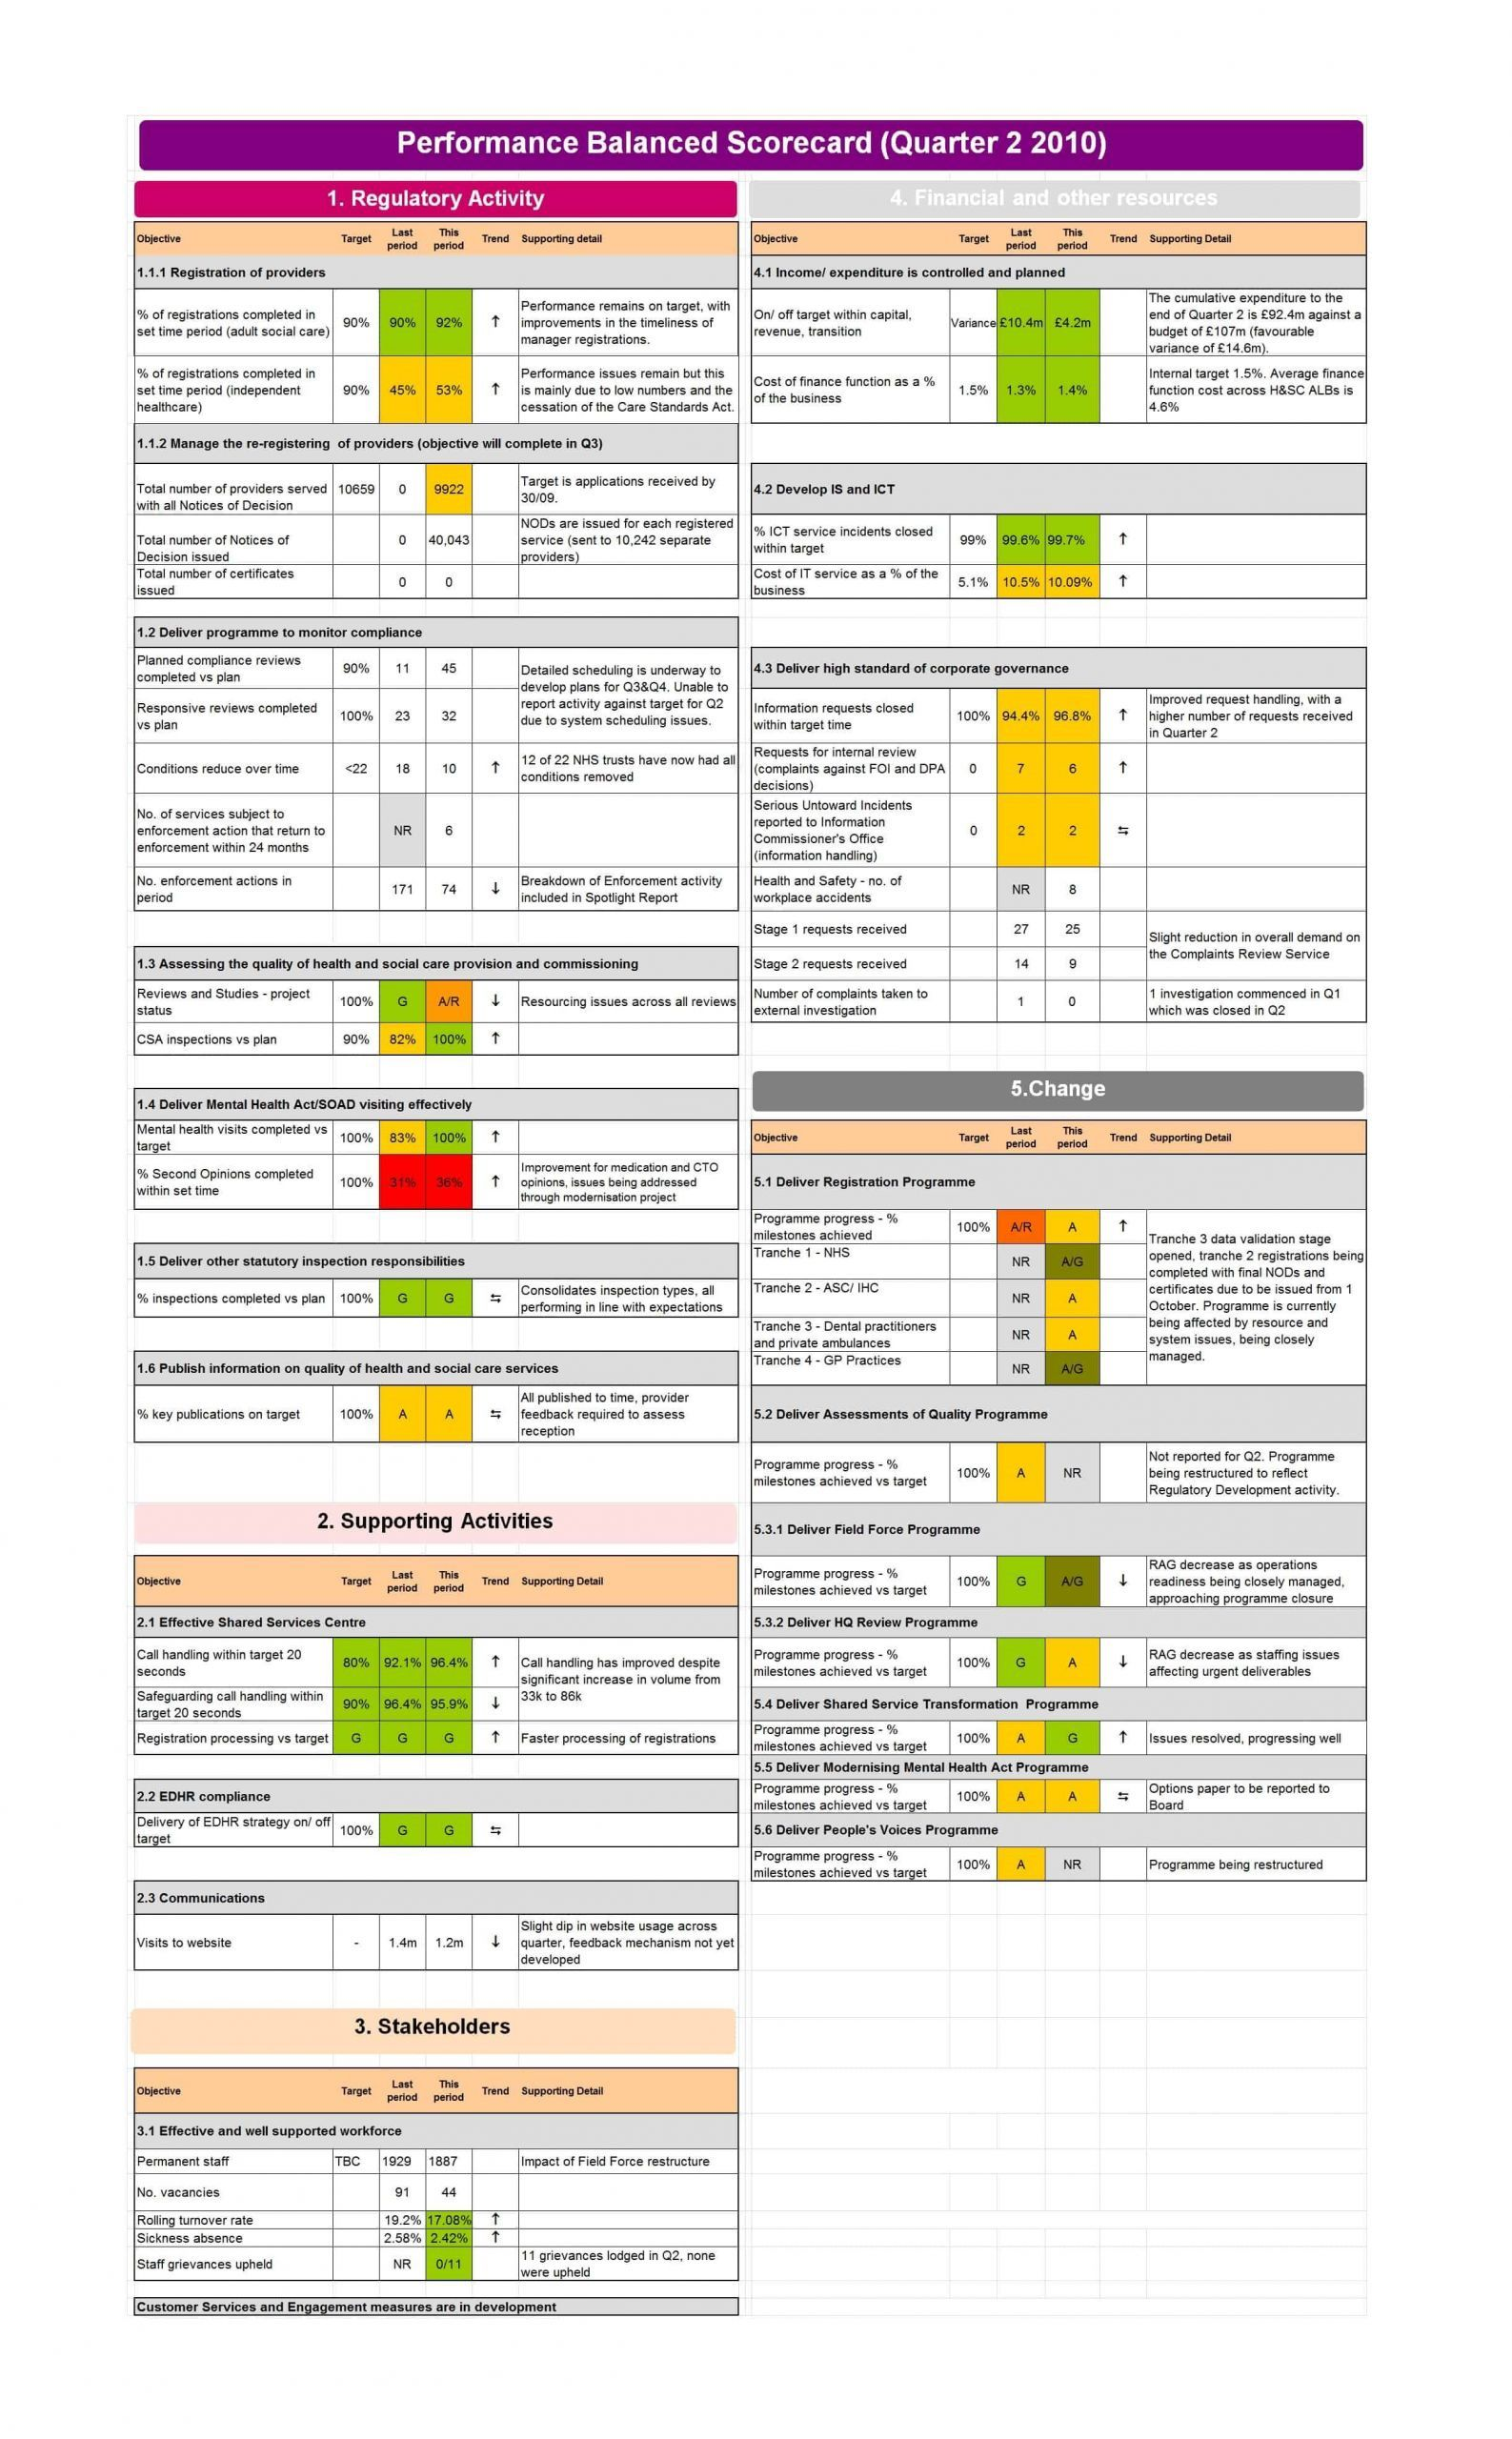 007 Shocking Score Nonprofit Busines Plan Template Highest Clarity Full